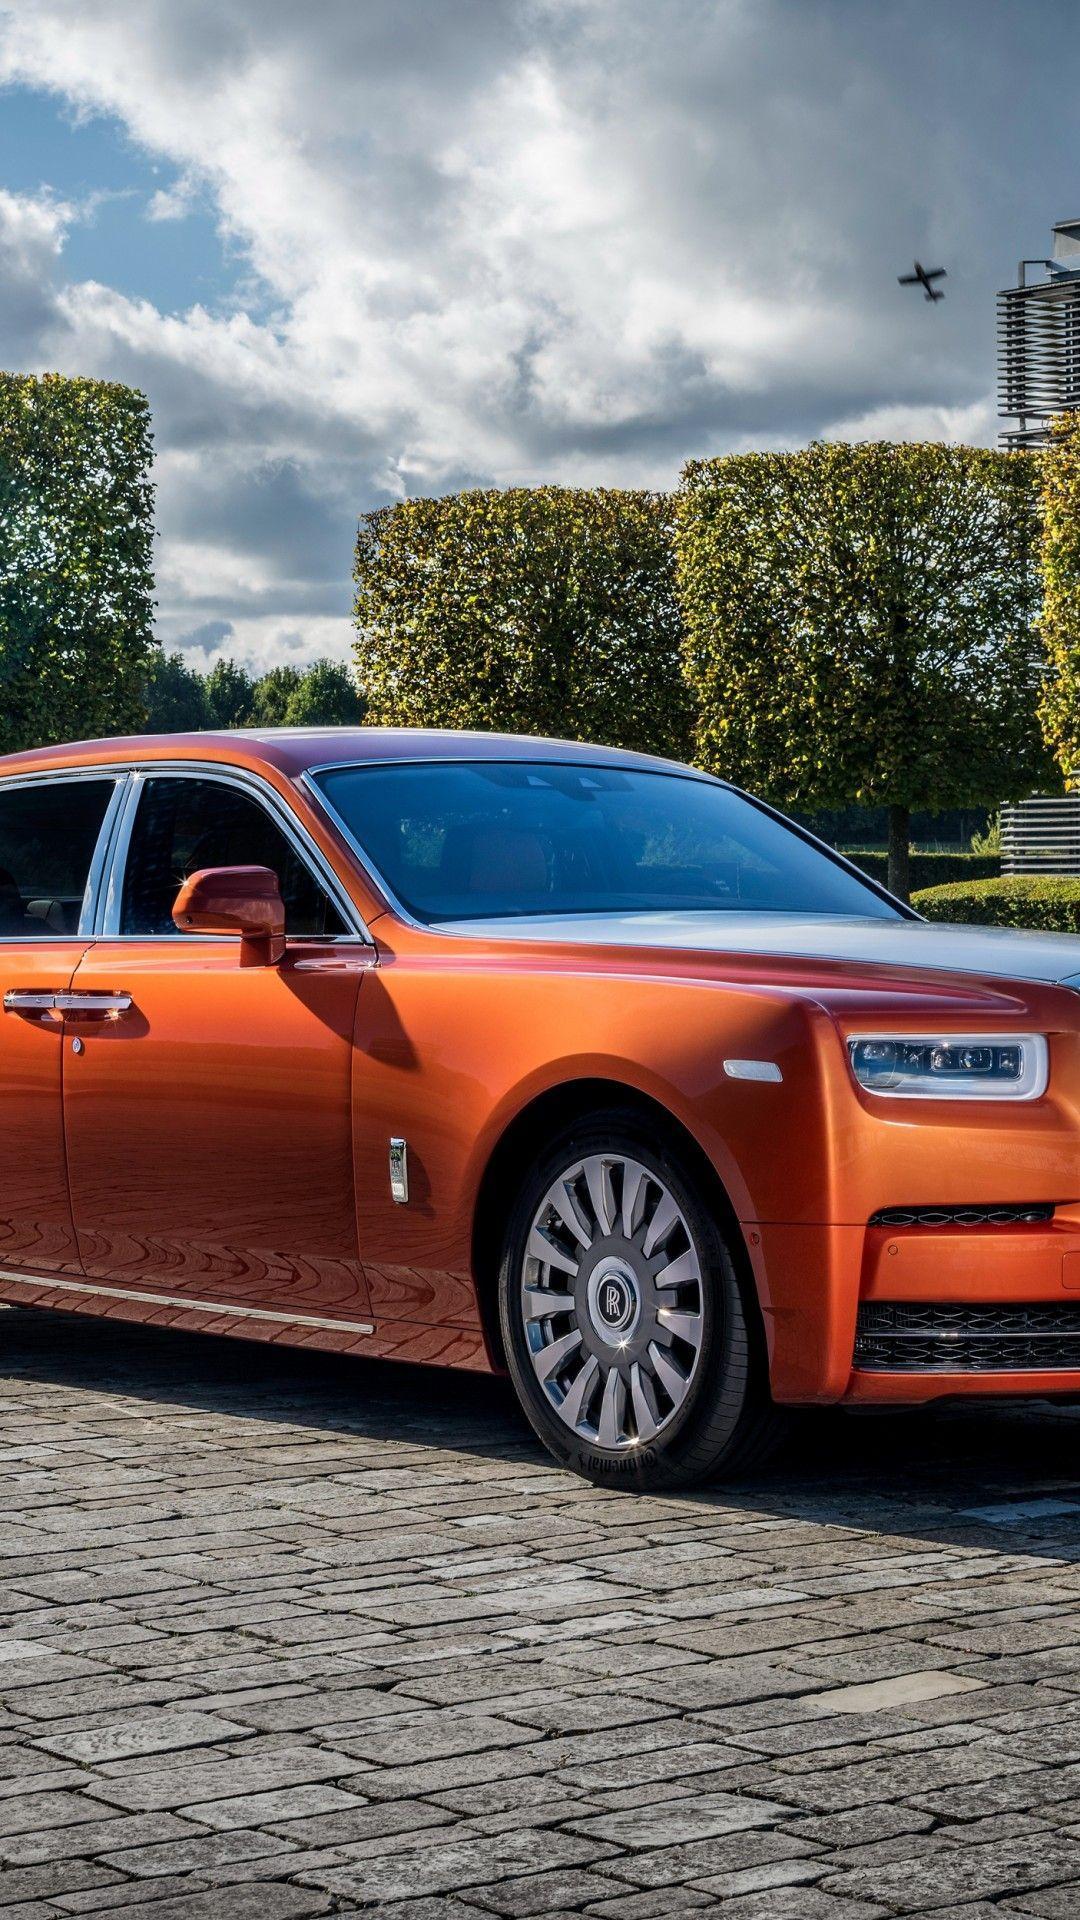 Rolls Royce Iphone Wallpapers Top Free Rolls Royce Iphone Backgrounds Wallpaperaccess